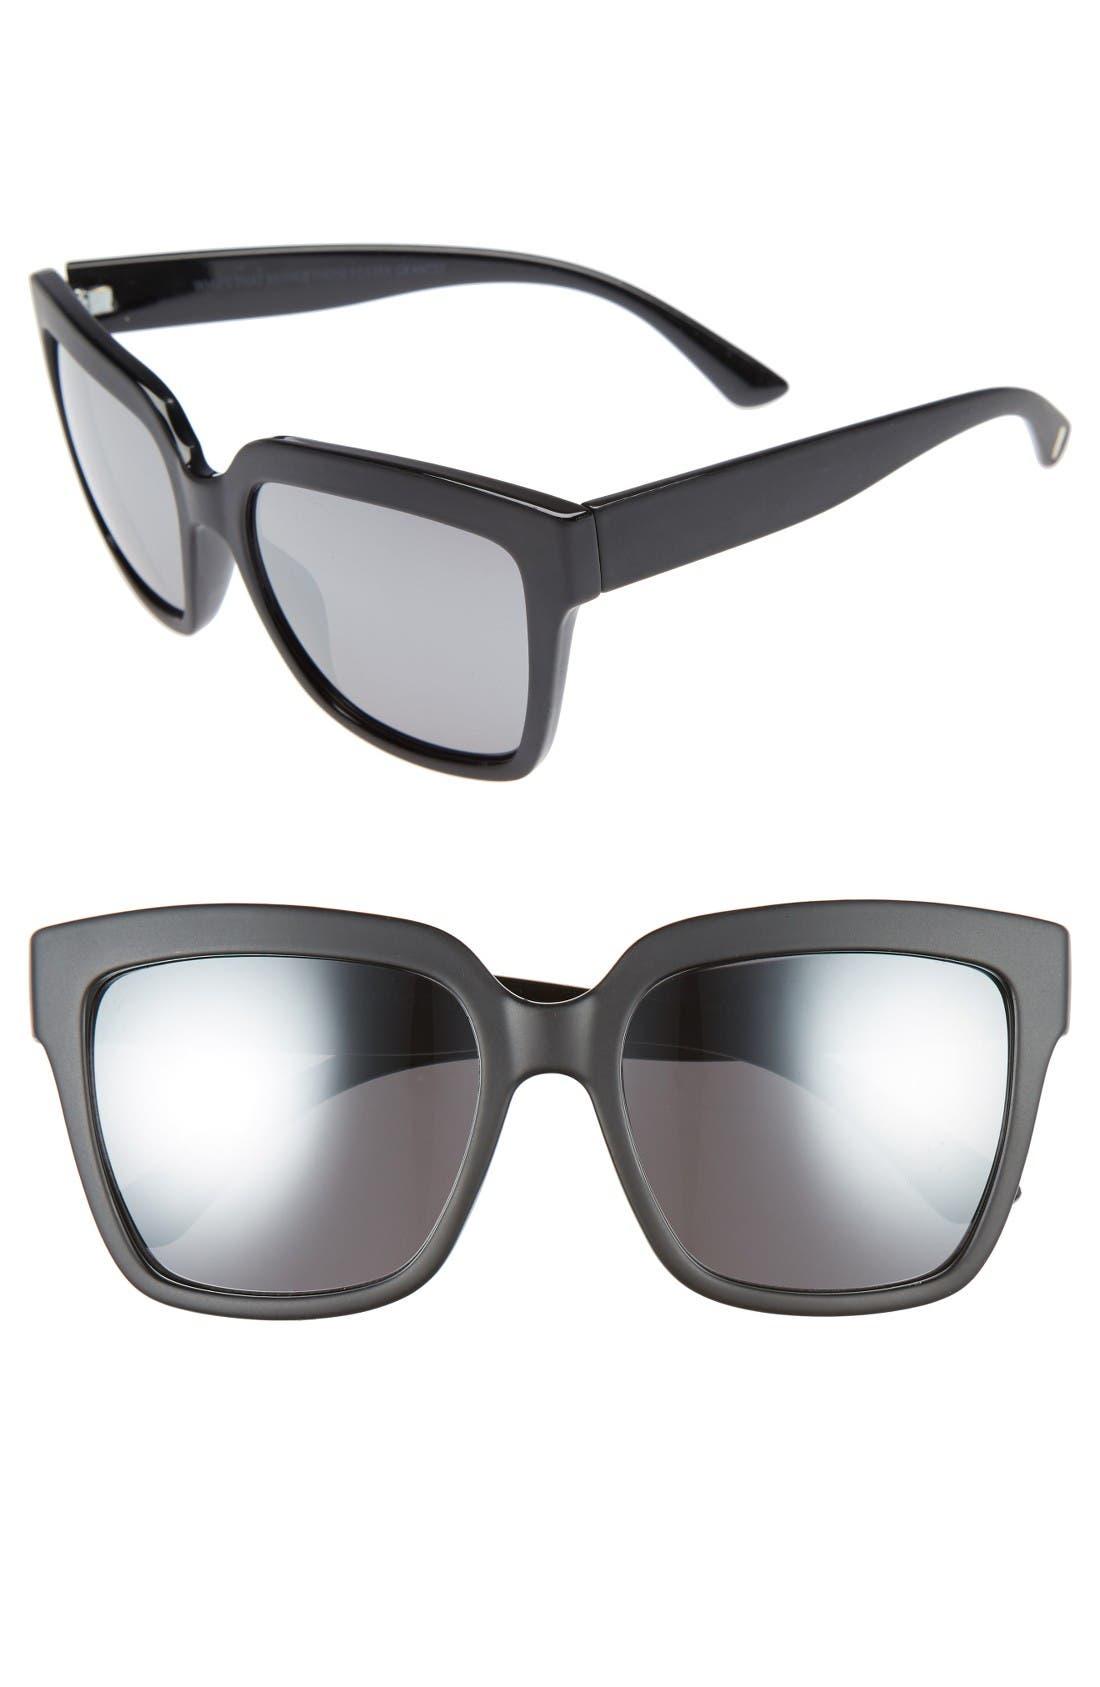 Item 8 MS.7 57mm Sunglasses